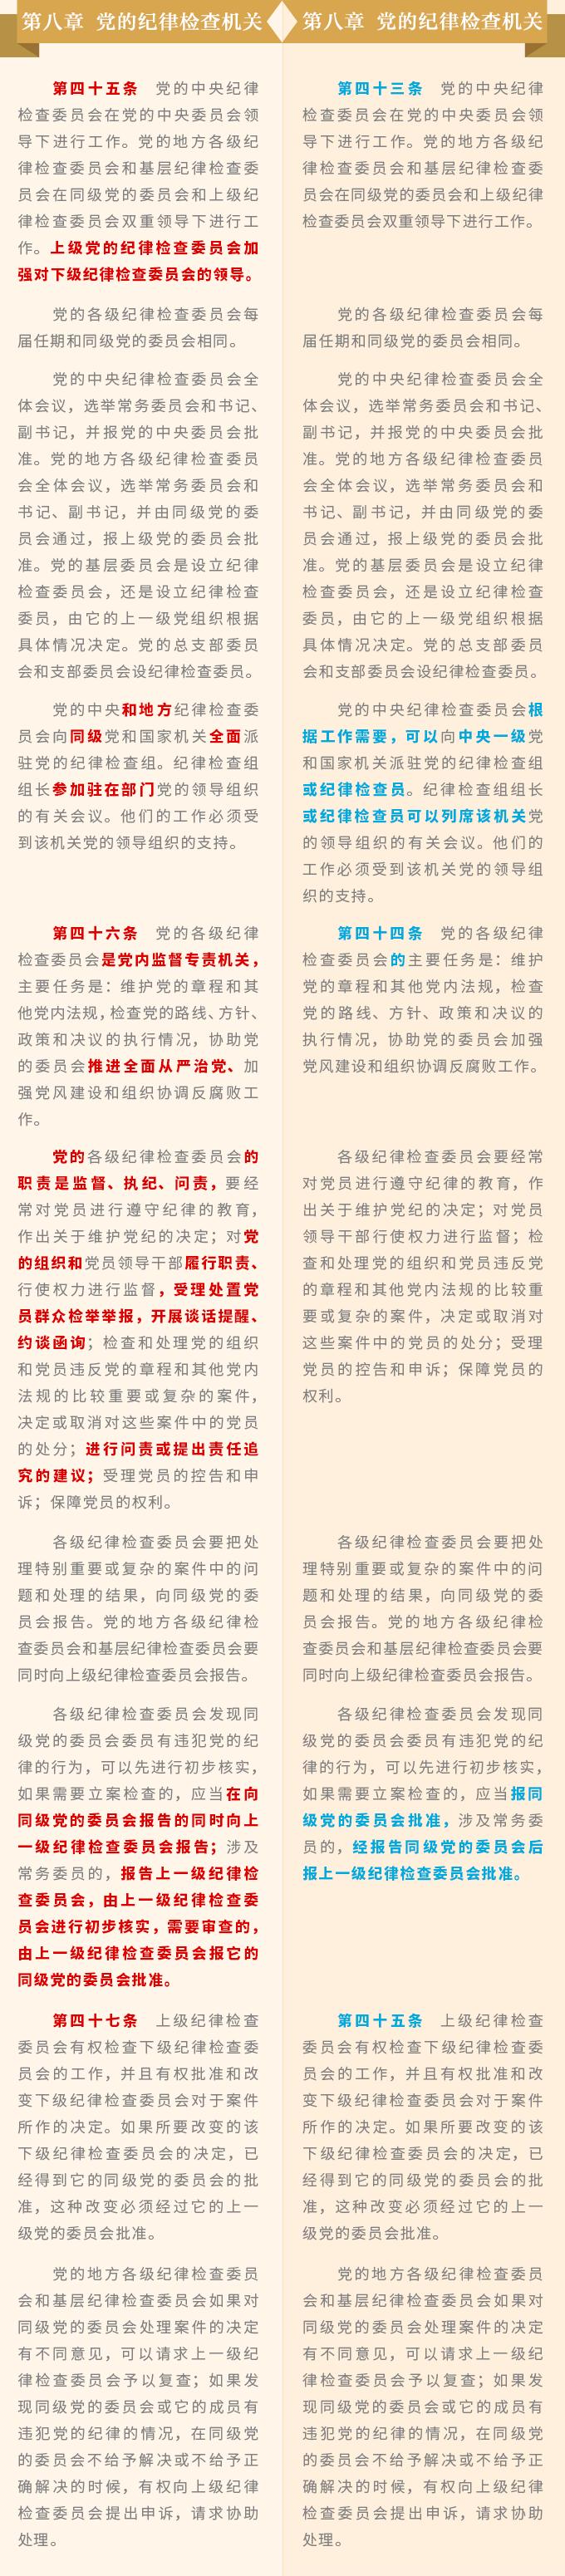 http://www.ccdi.gov.cn/yw/201710/W020171031664658034285.png